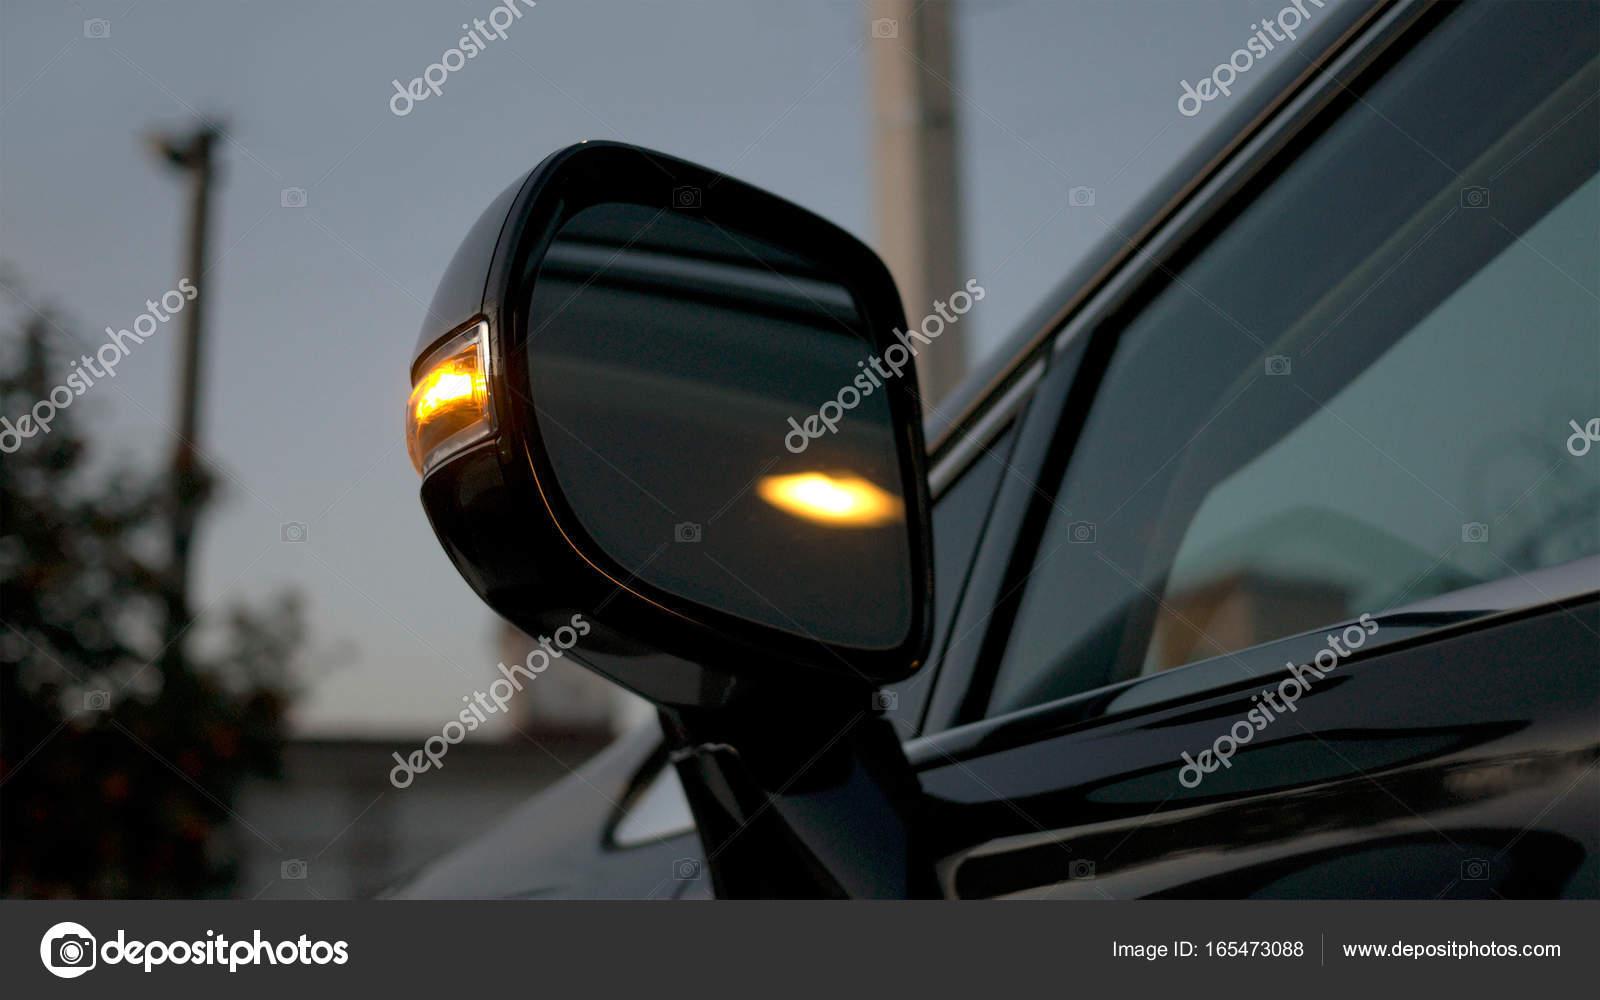 Espejo retrovisor de coche indicador de direcci n est for Espejo retrovisor interior